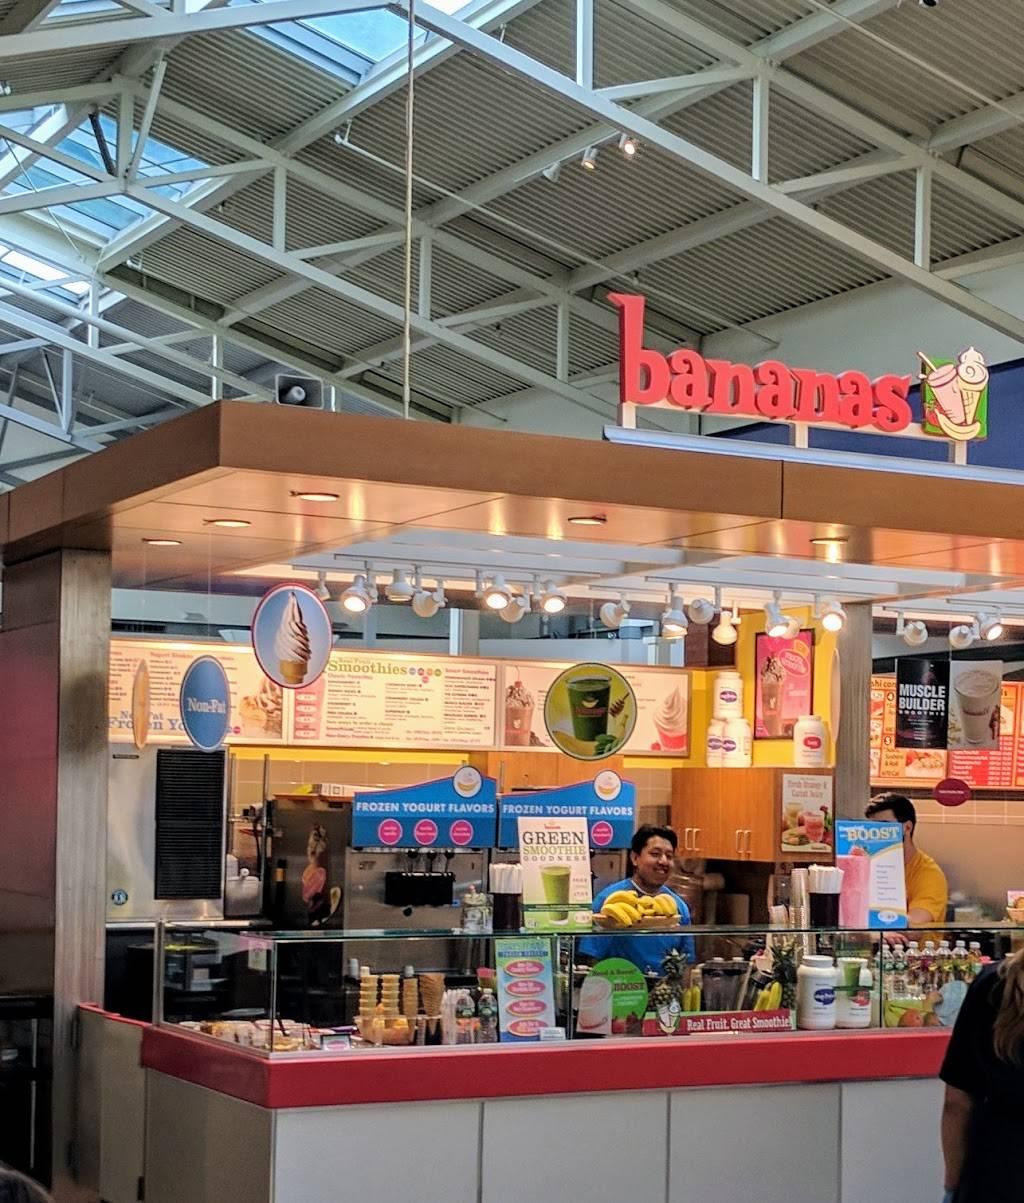 Bananas | meal takeaway | 400 Commons Way Sp 461, Bridgewater, NJ 08807, USA | 9085266072 OR +1 908-526-6072